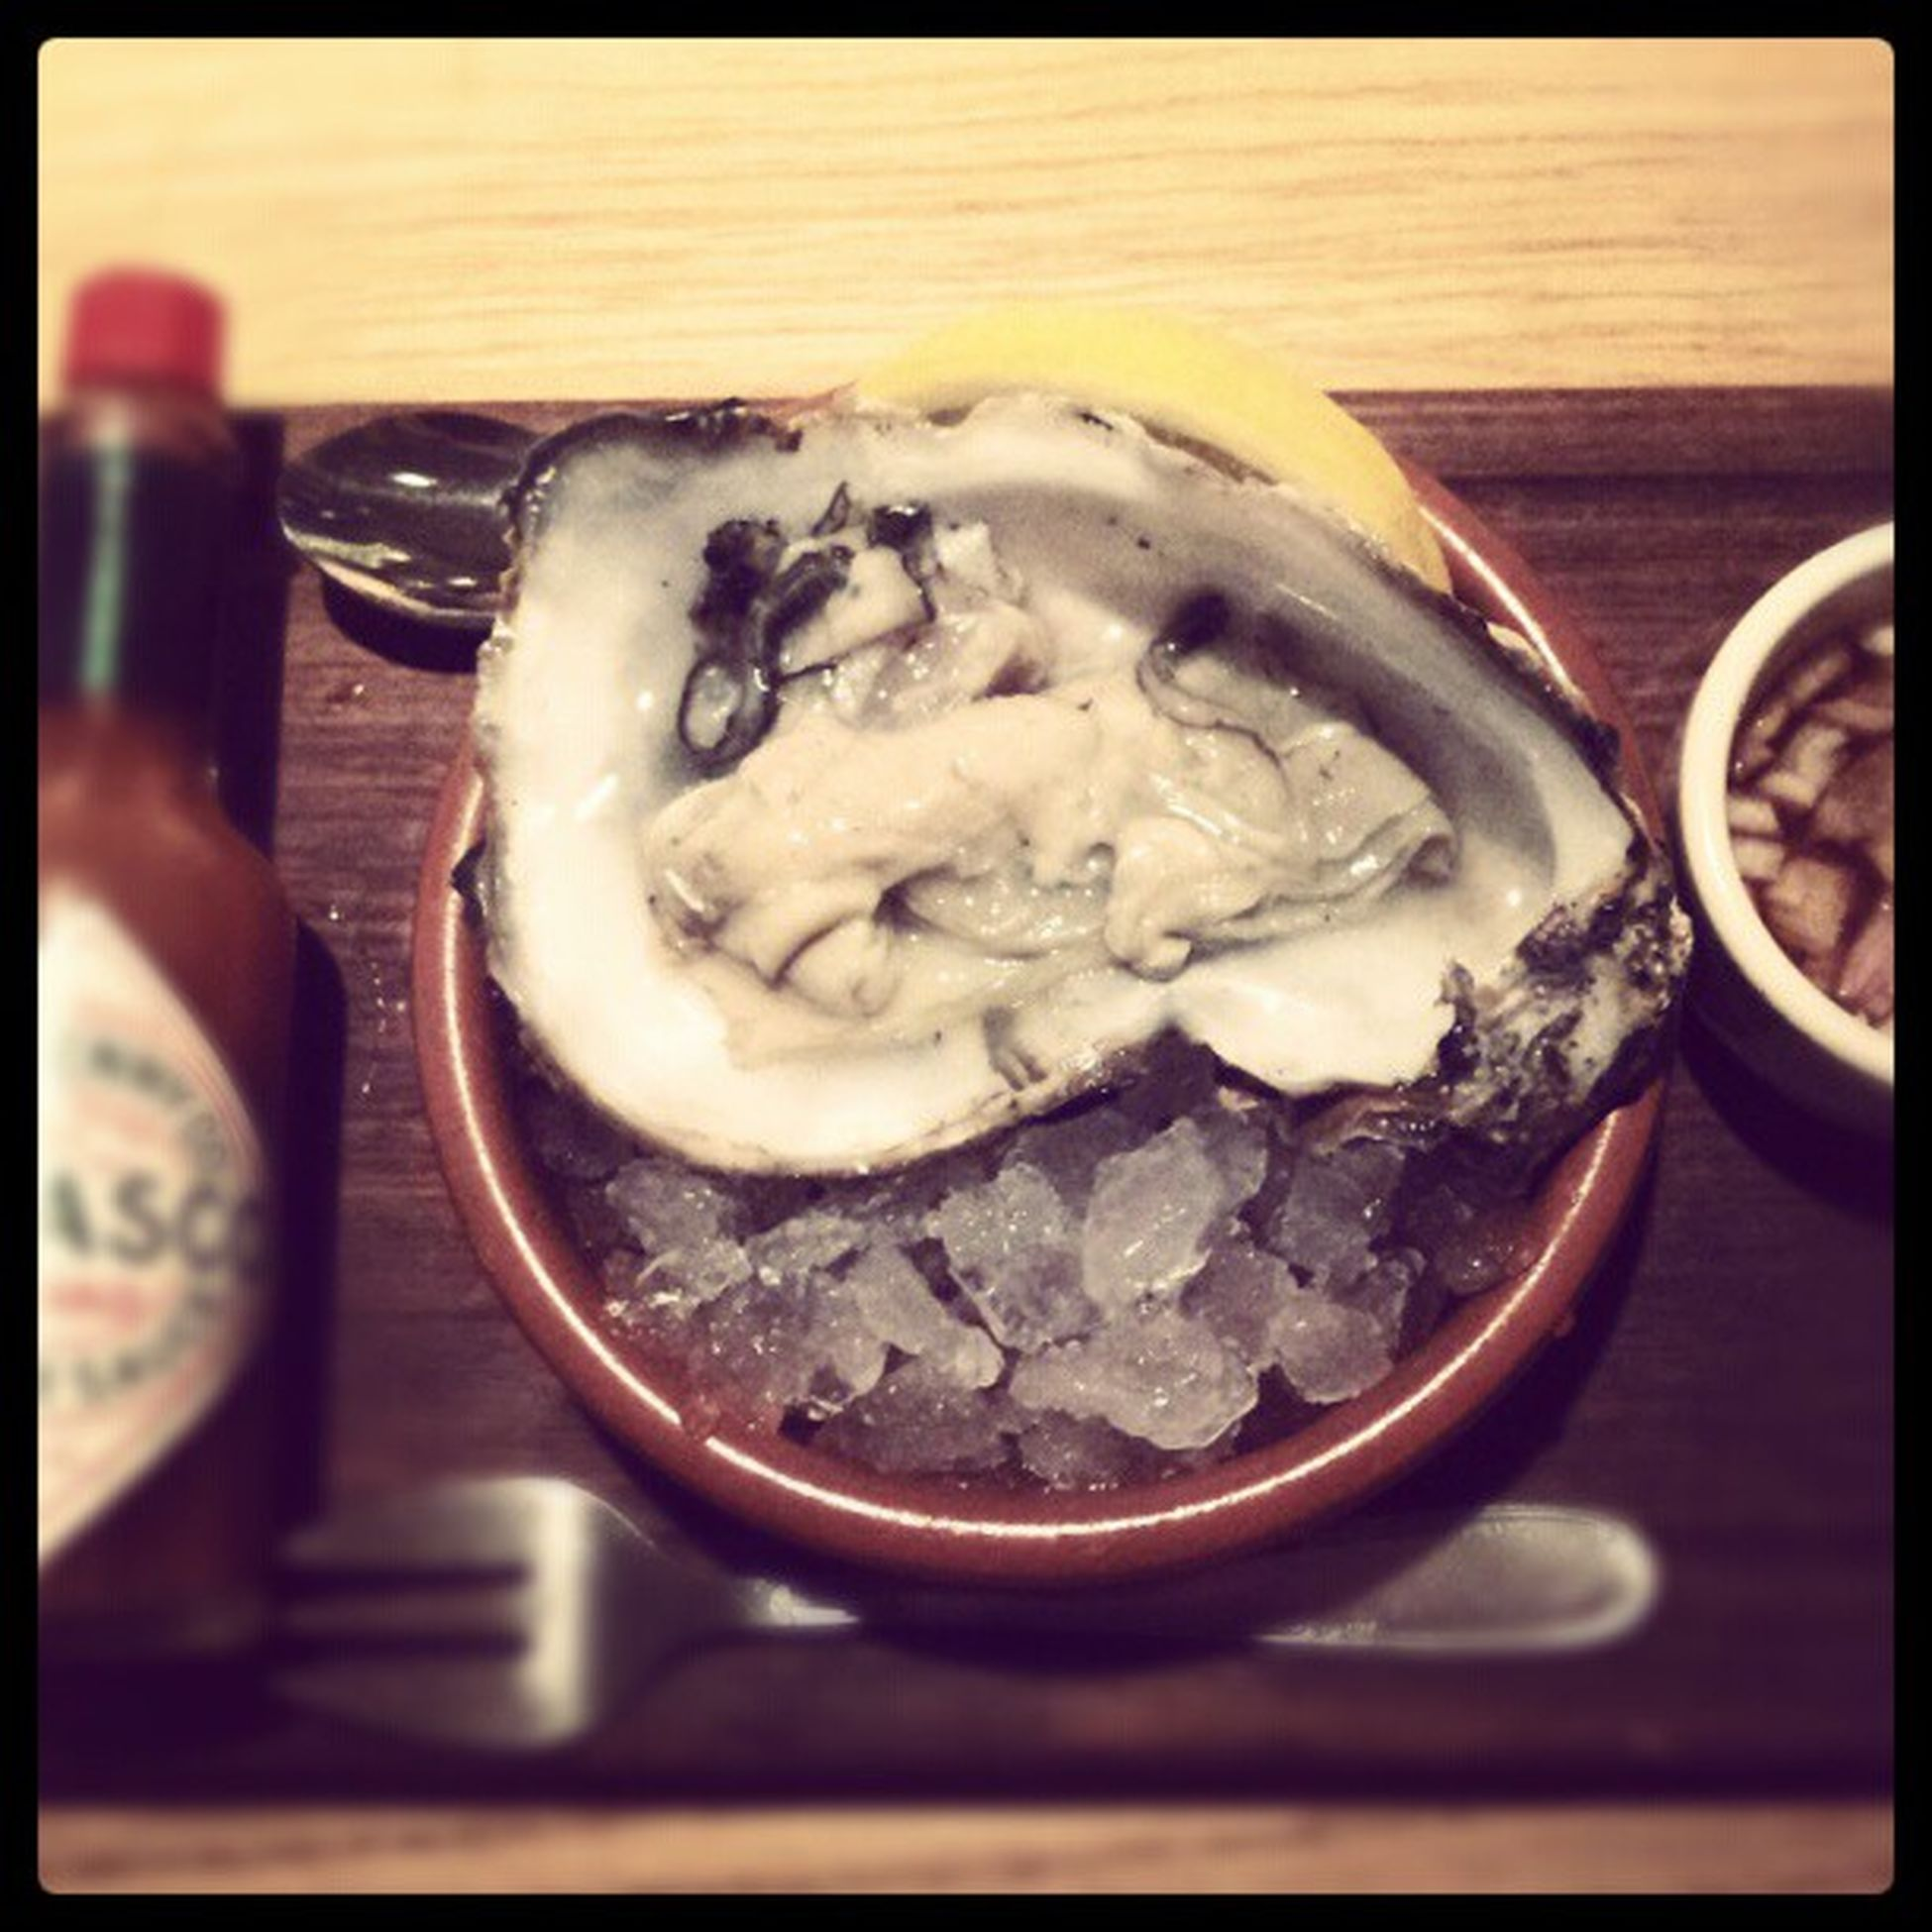 Oyster  Food SHELLFISH  Shell Tabasco Blackhousegrill Blackhouse